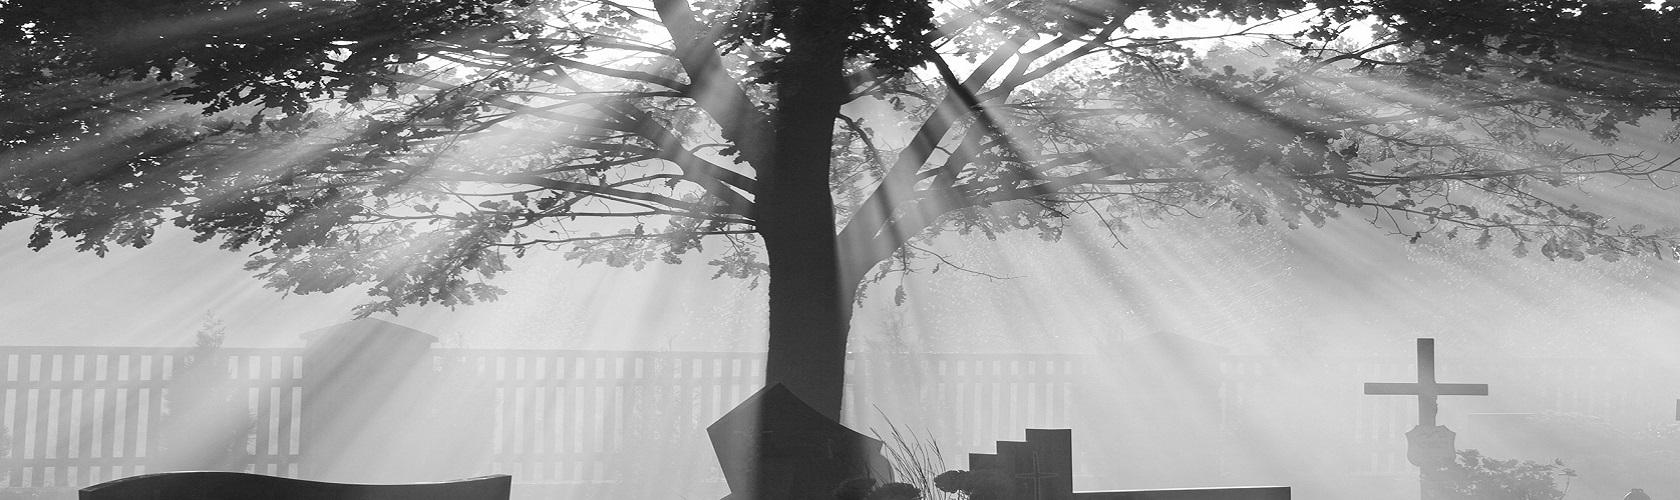 funerali monza galli